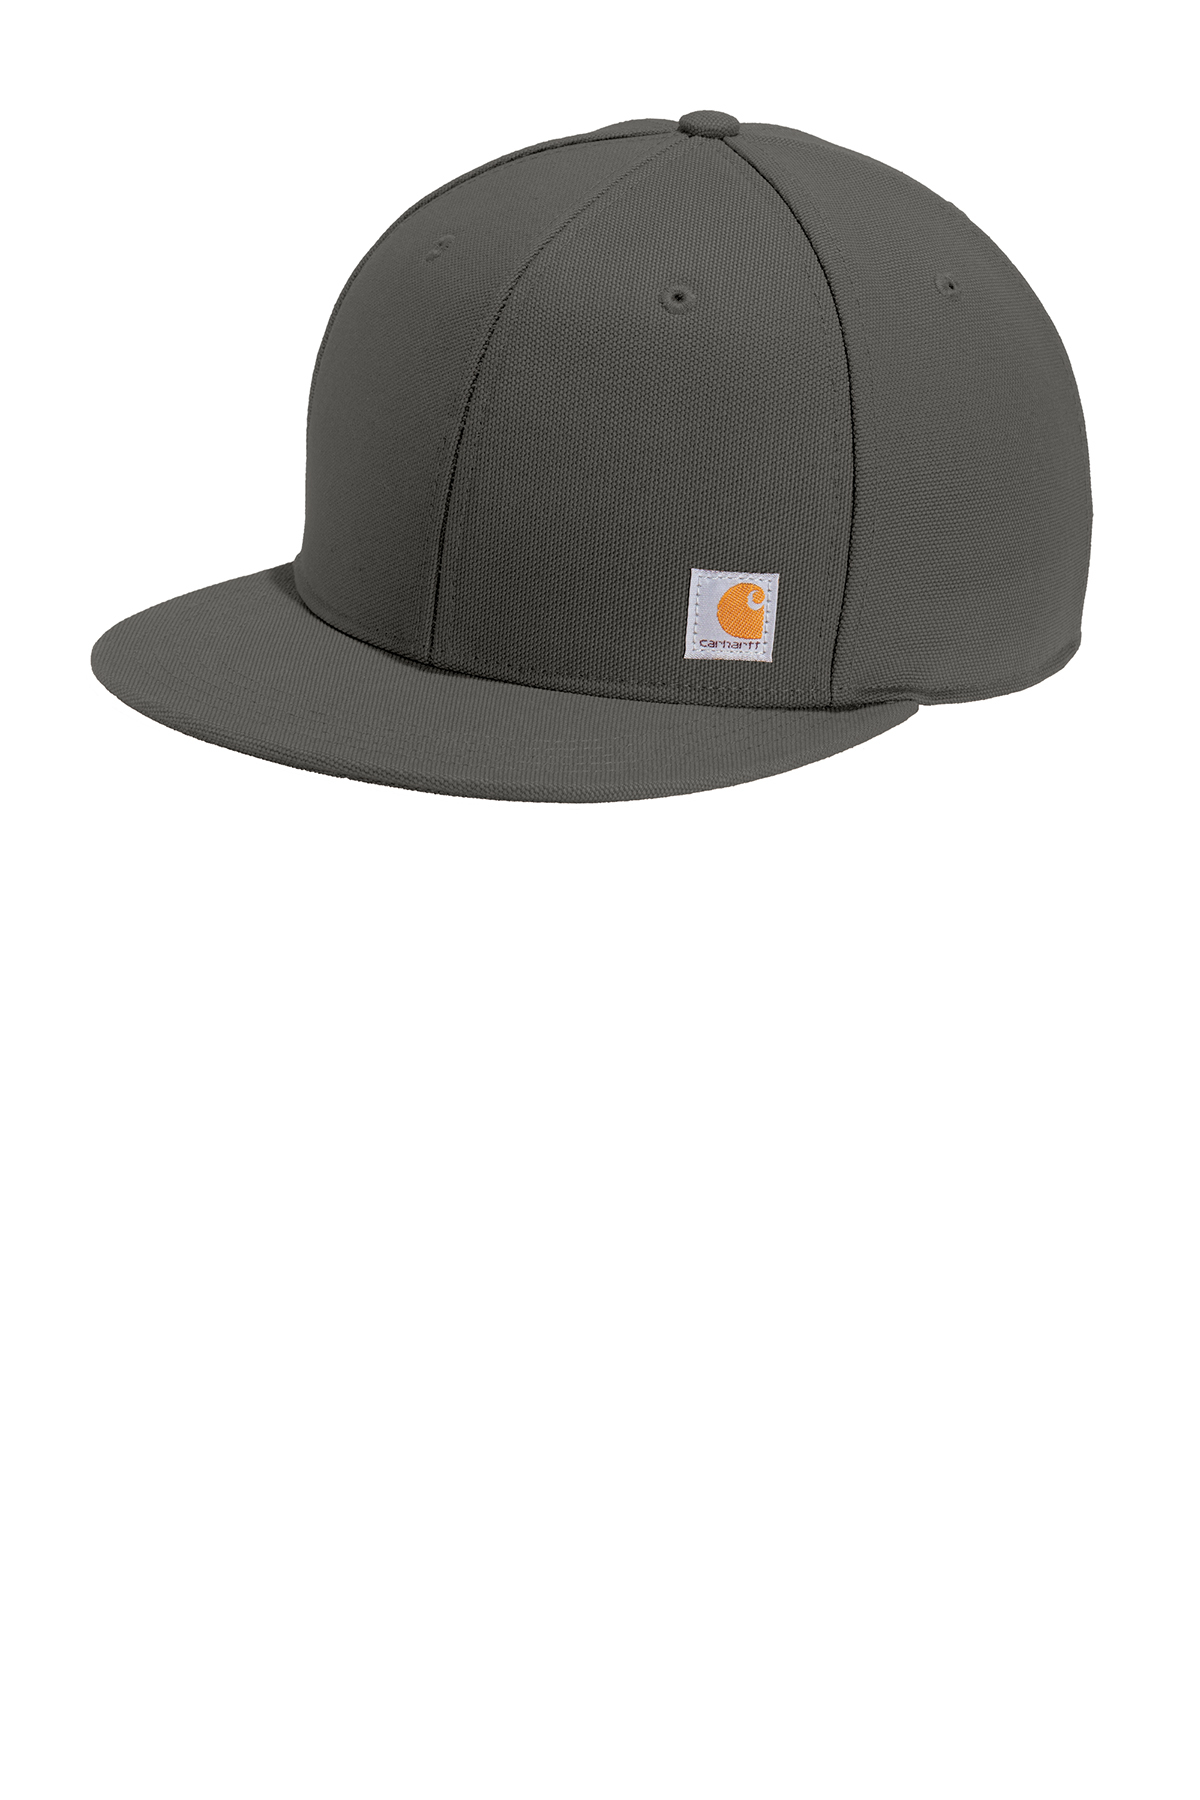 406598d2e5a06 Carhartt ® Ashland Cap